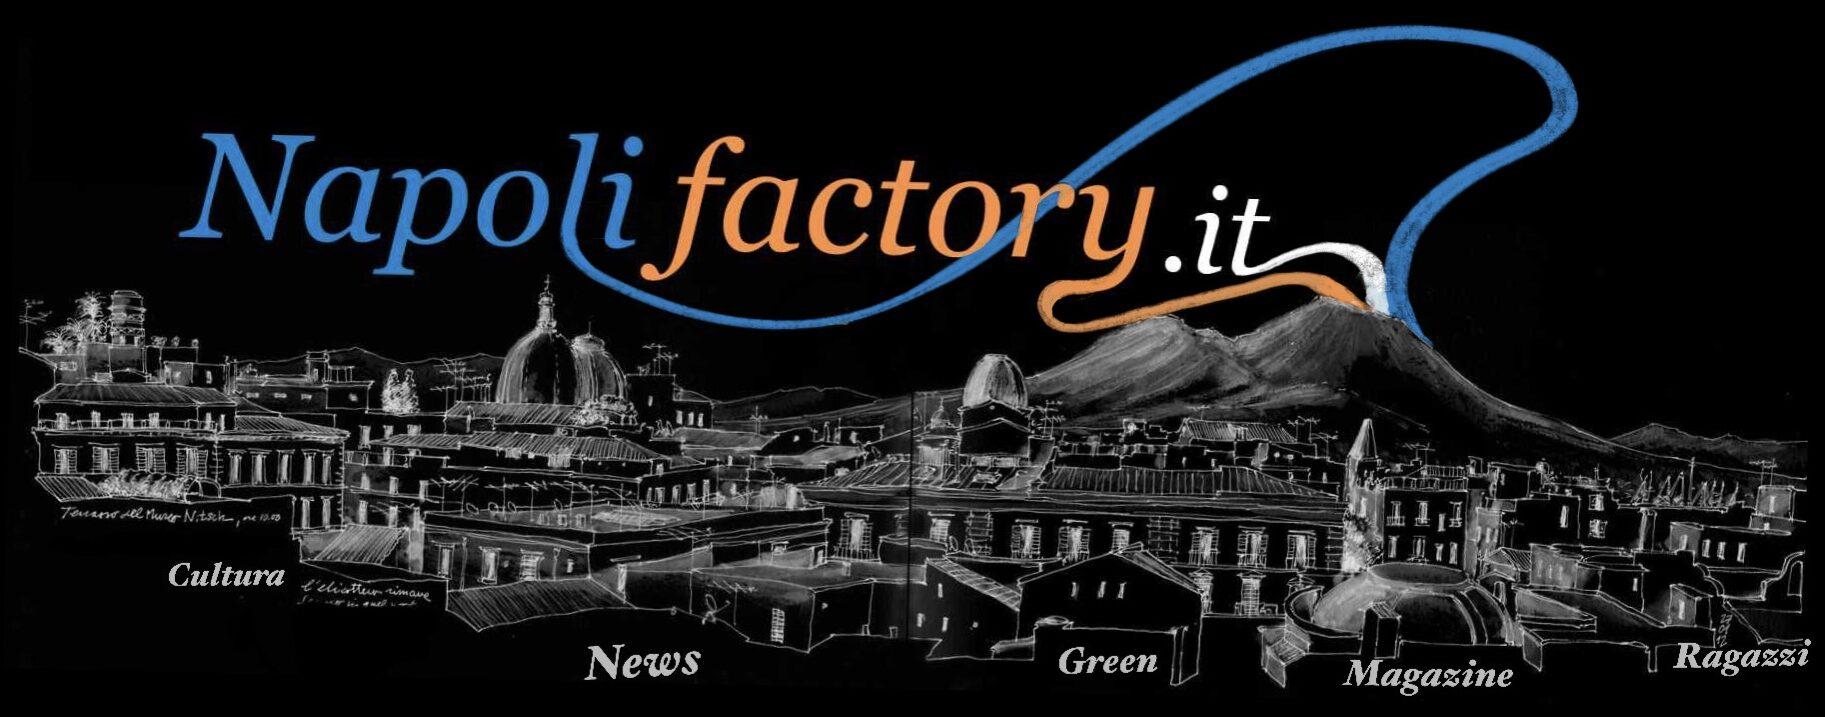 Napolifactory